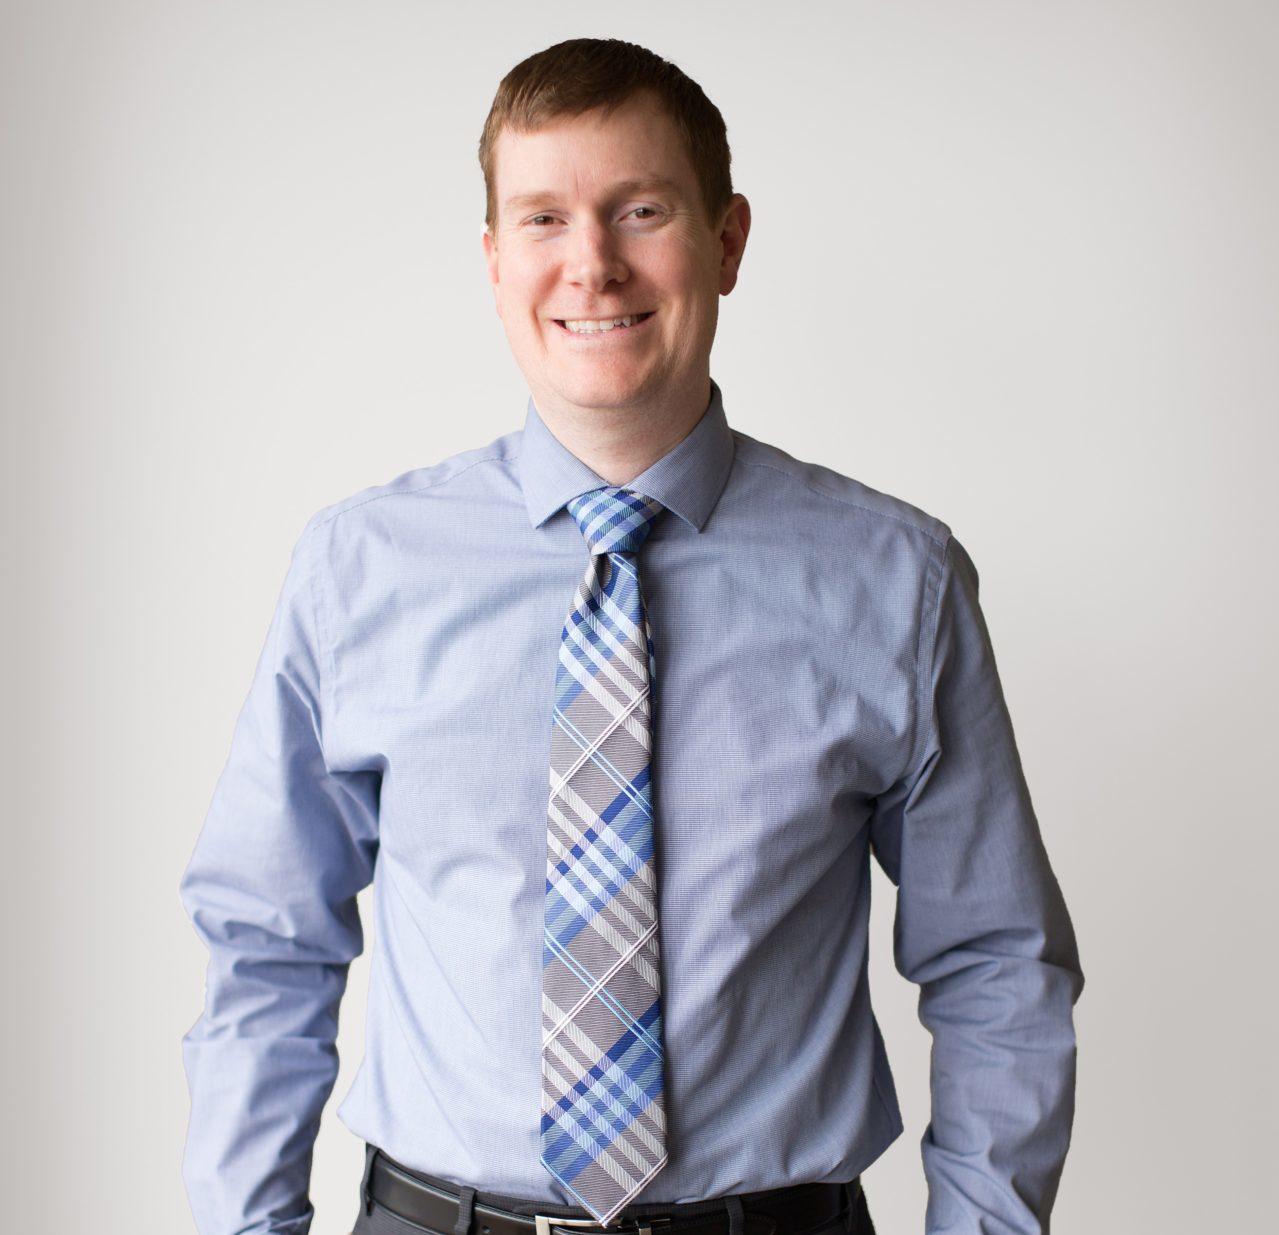 Shawn Jennison